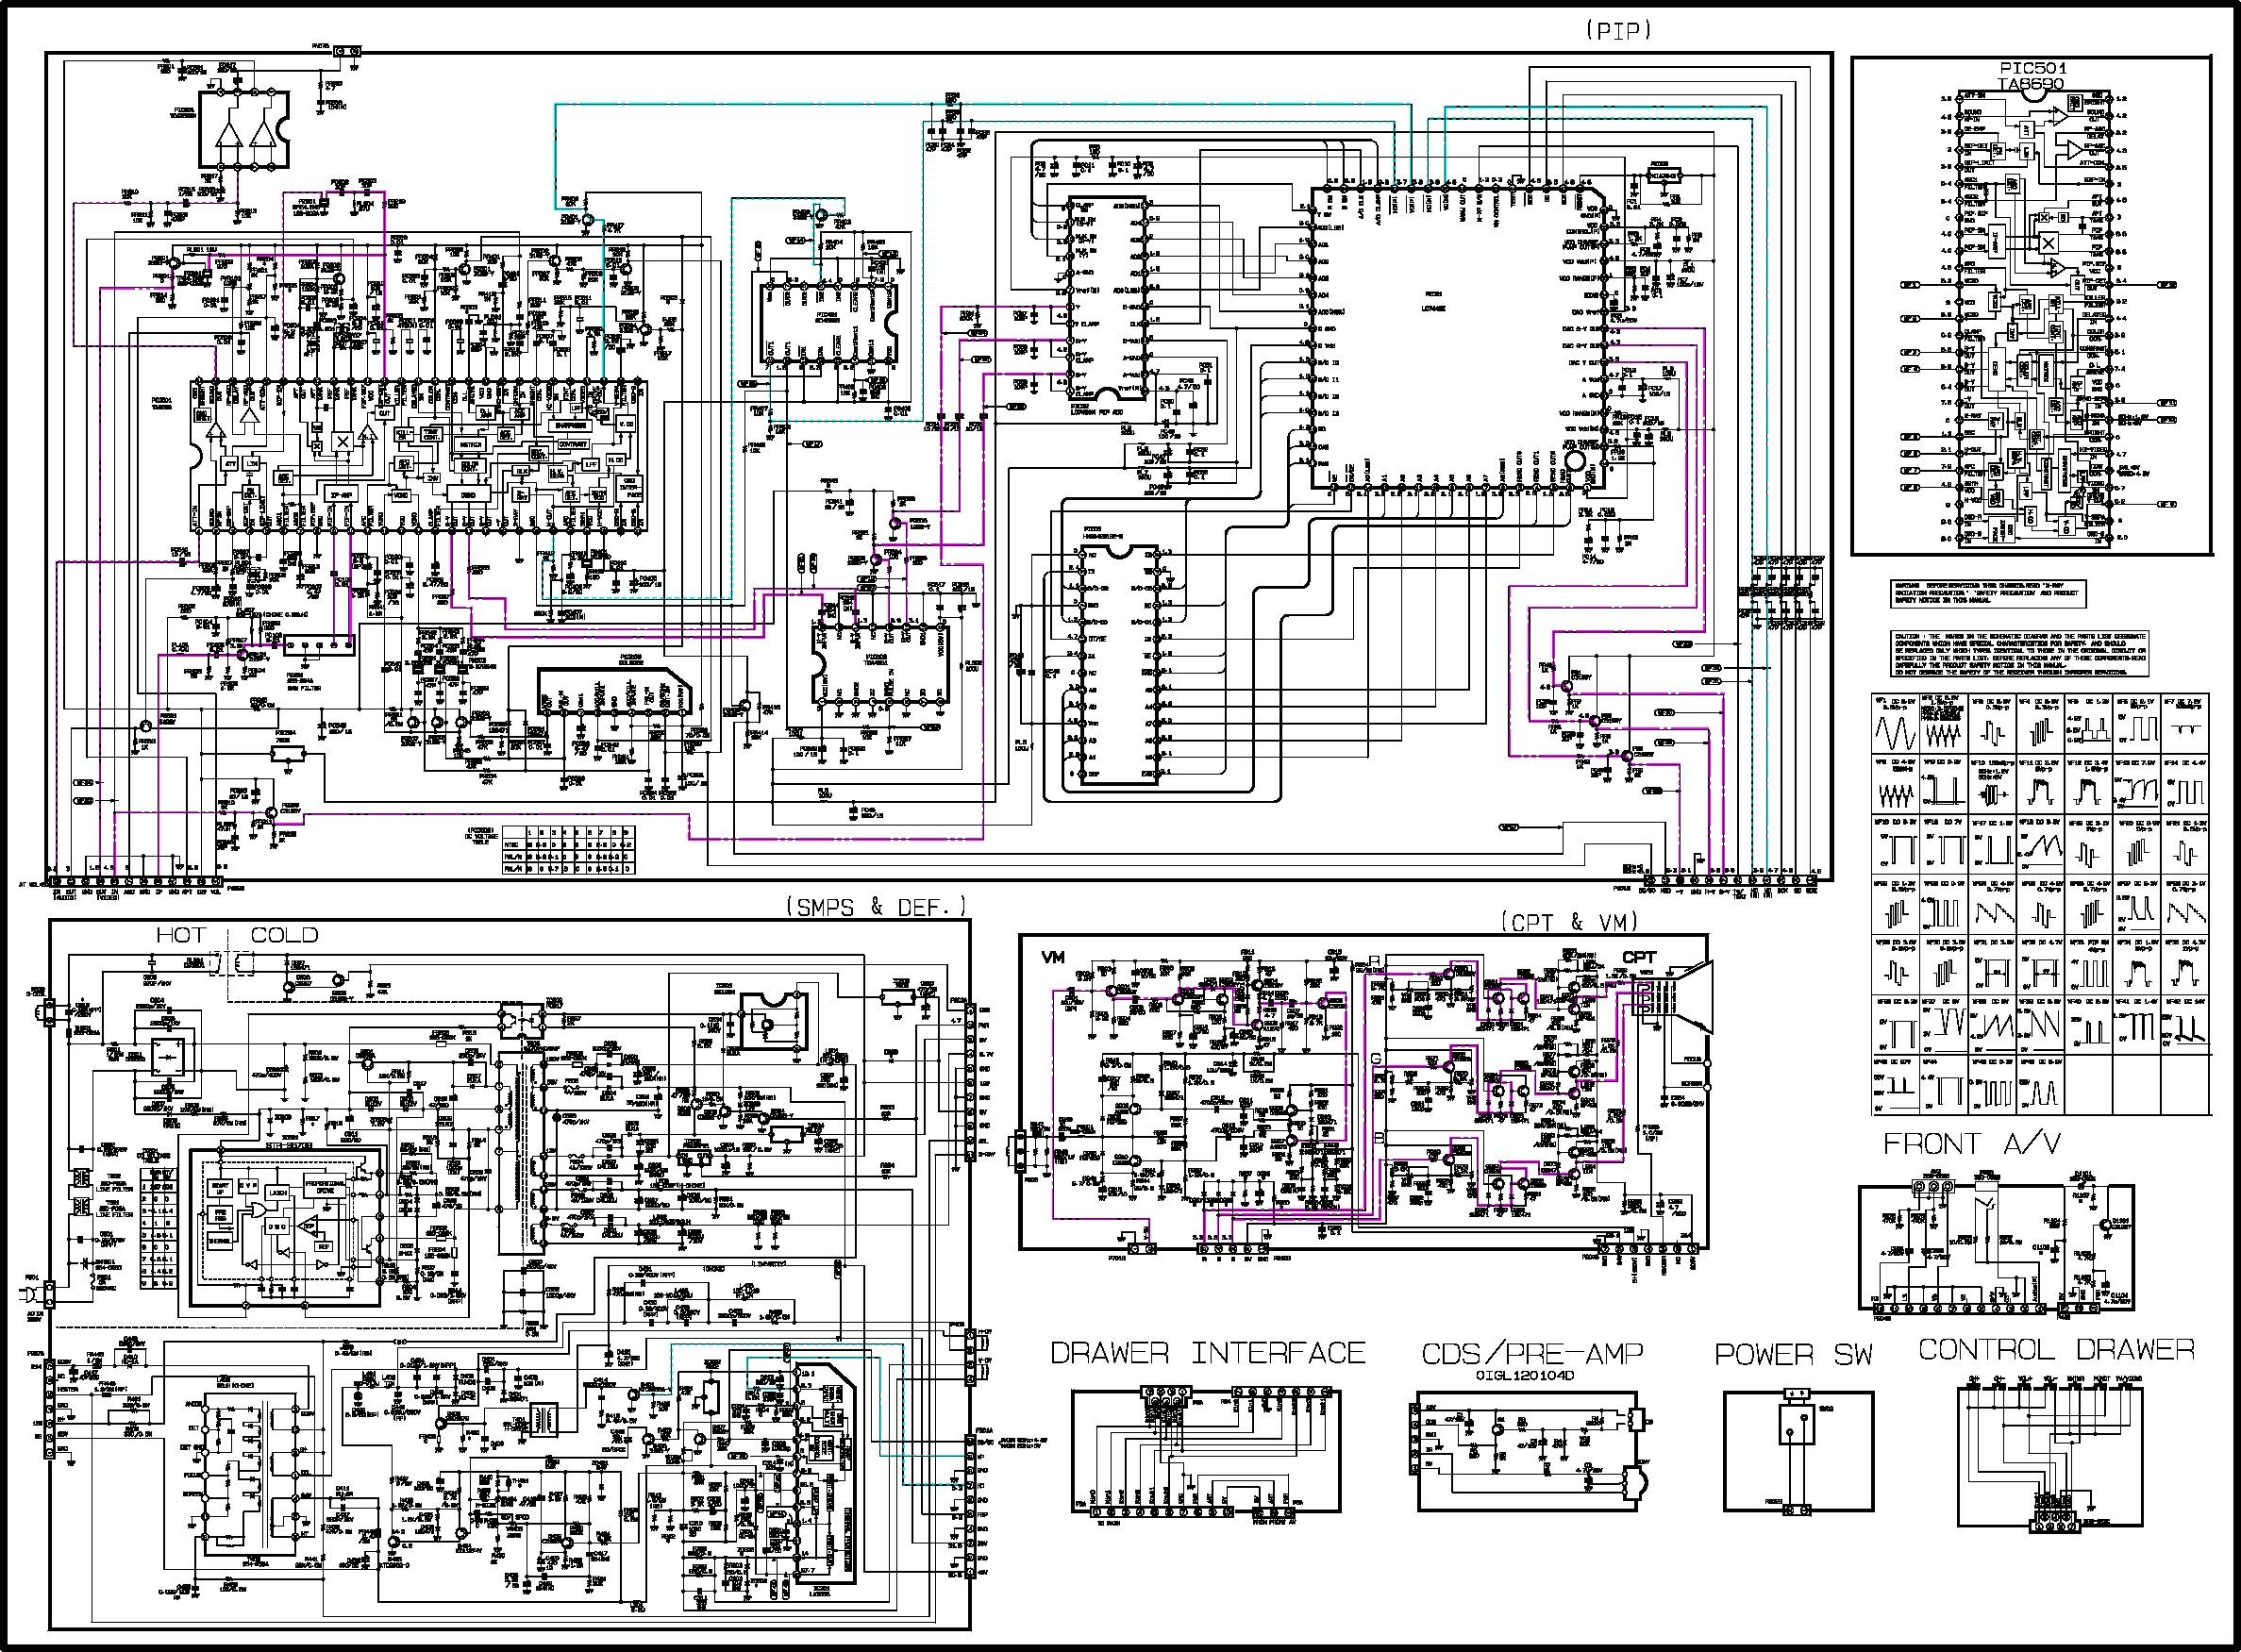 Lg Lg Cp 34c62p Chasis Mc 53a Pdf Diagramas De Televisores Lcd Y Plasma  U2013 Diagramasde Com